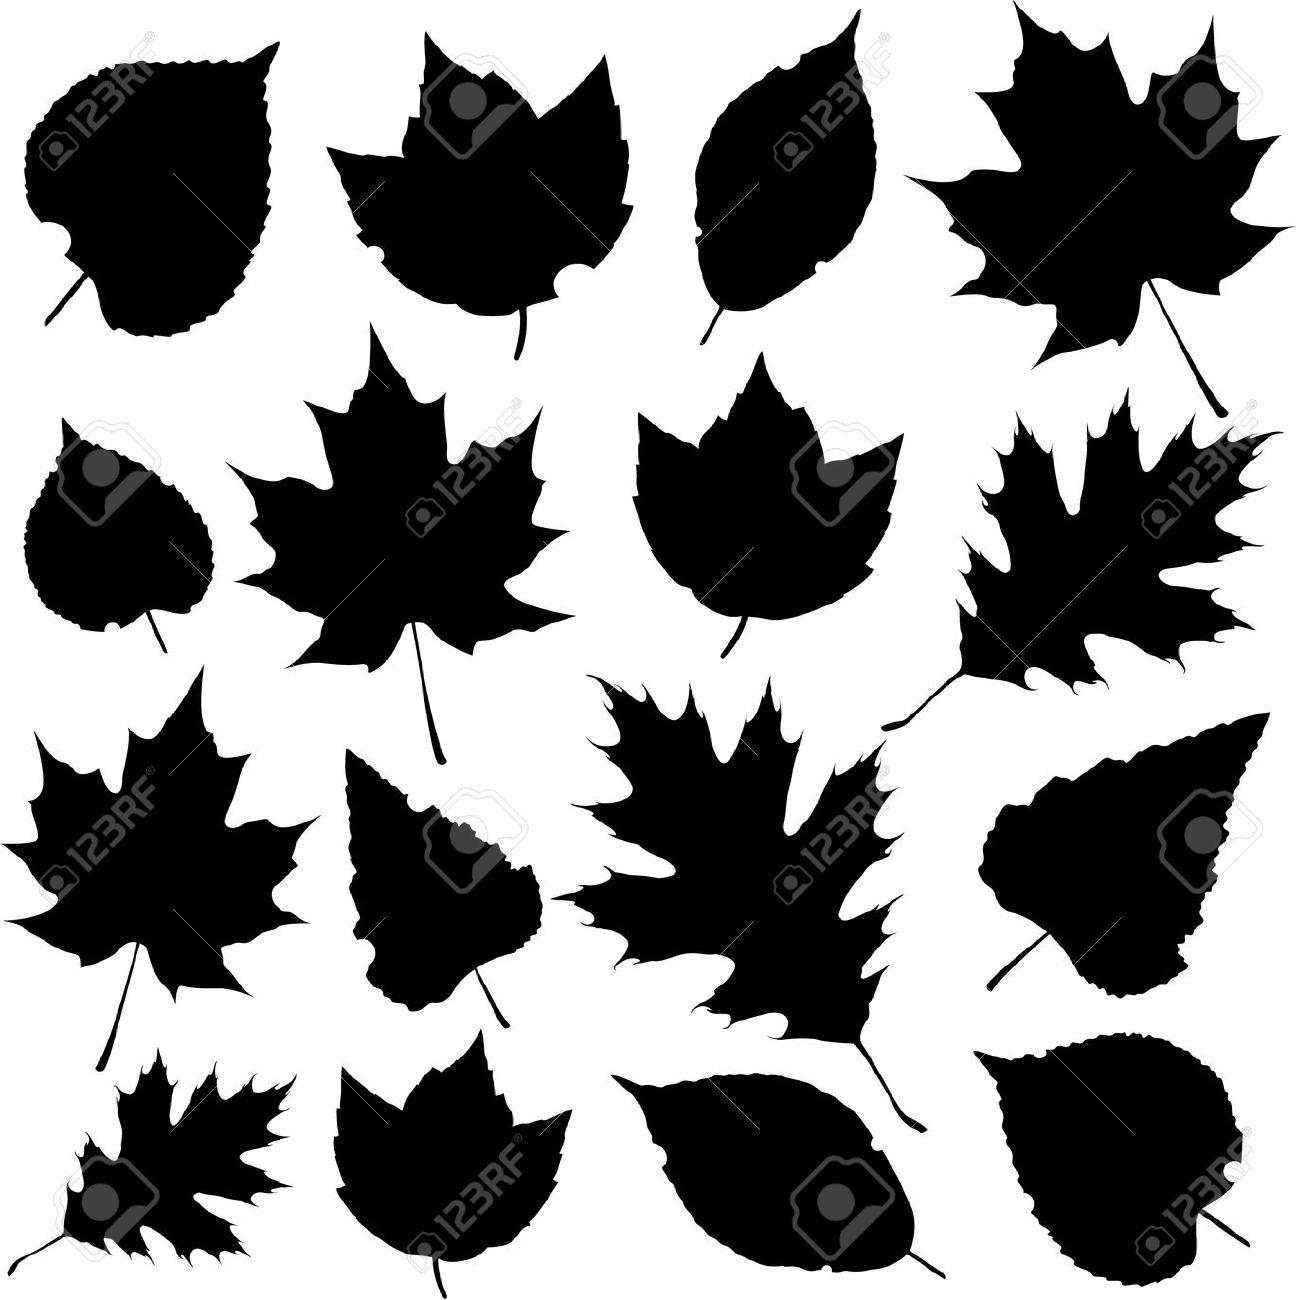 Foliage Silhouette Clipart Clipground